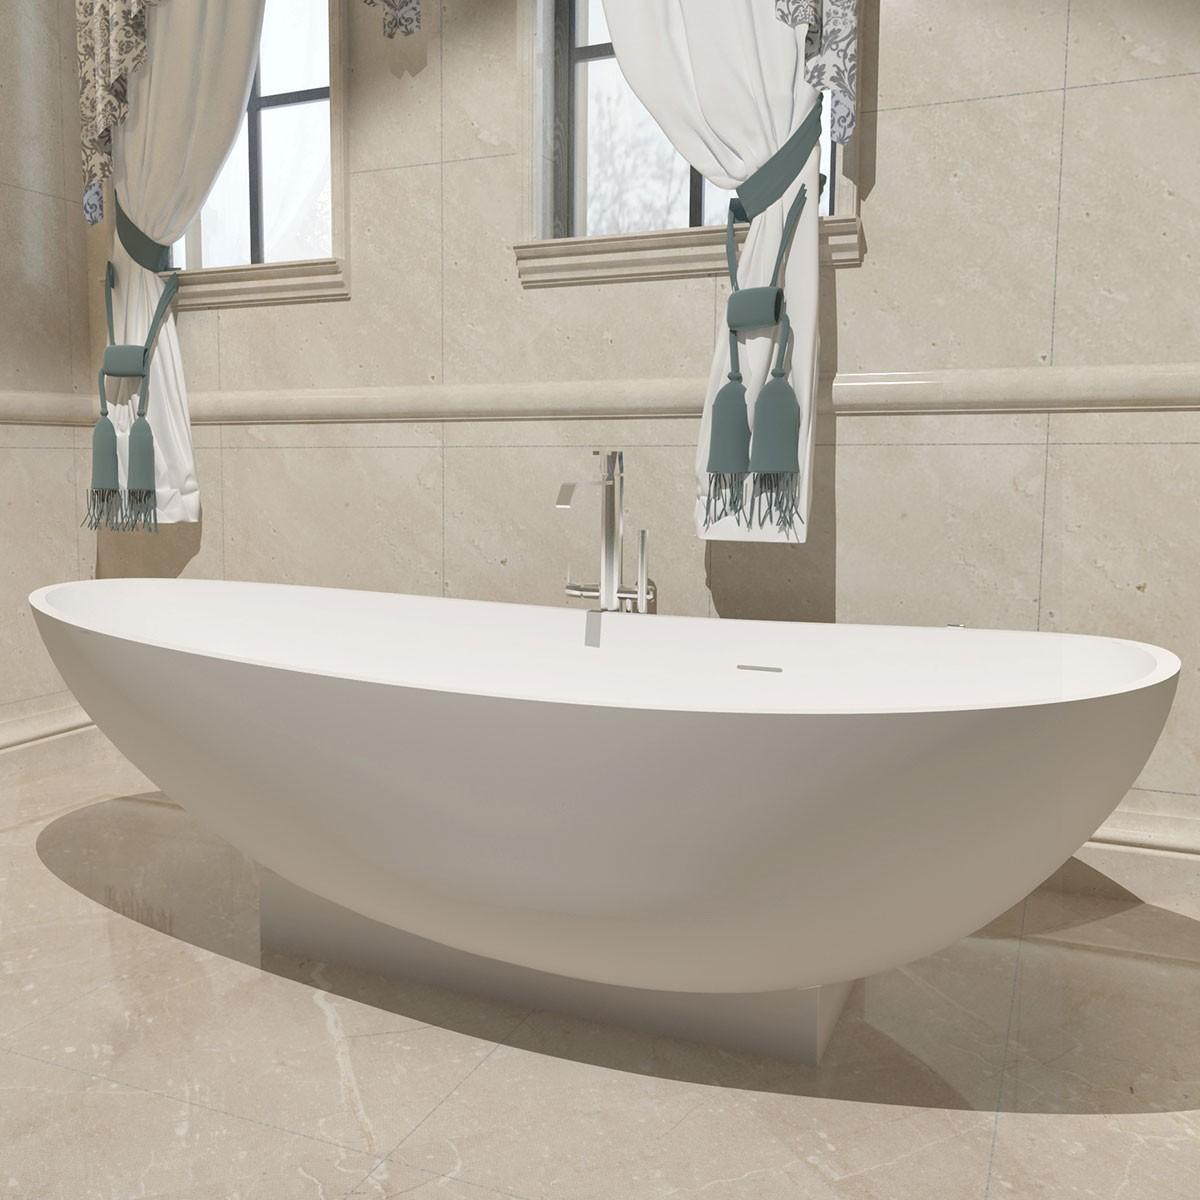 71 po baignoire autoportante en pierre de synth se blanc. Black Bedroom Furniture Sets. Home Design Ideas